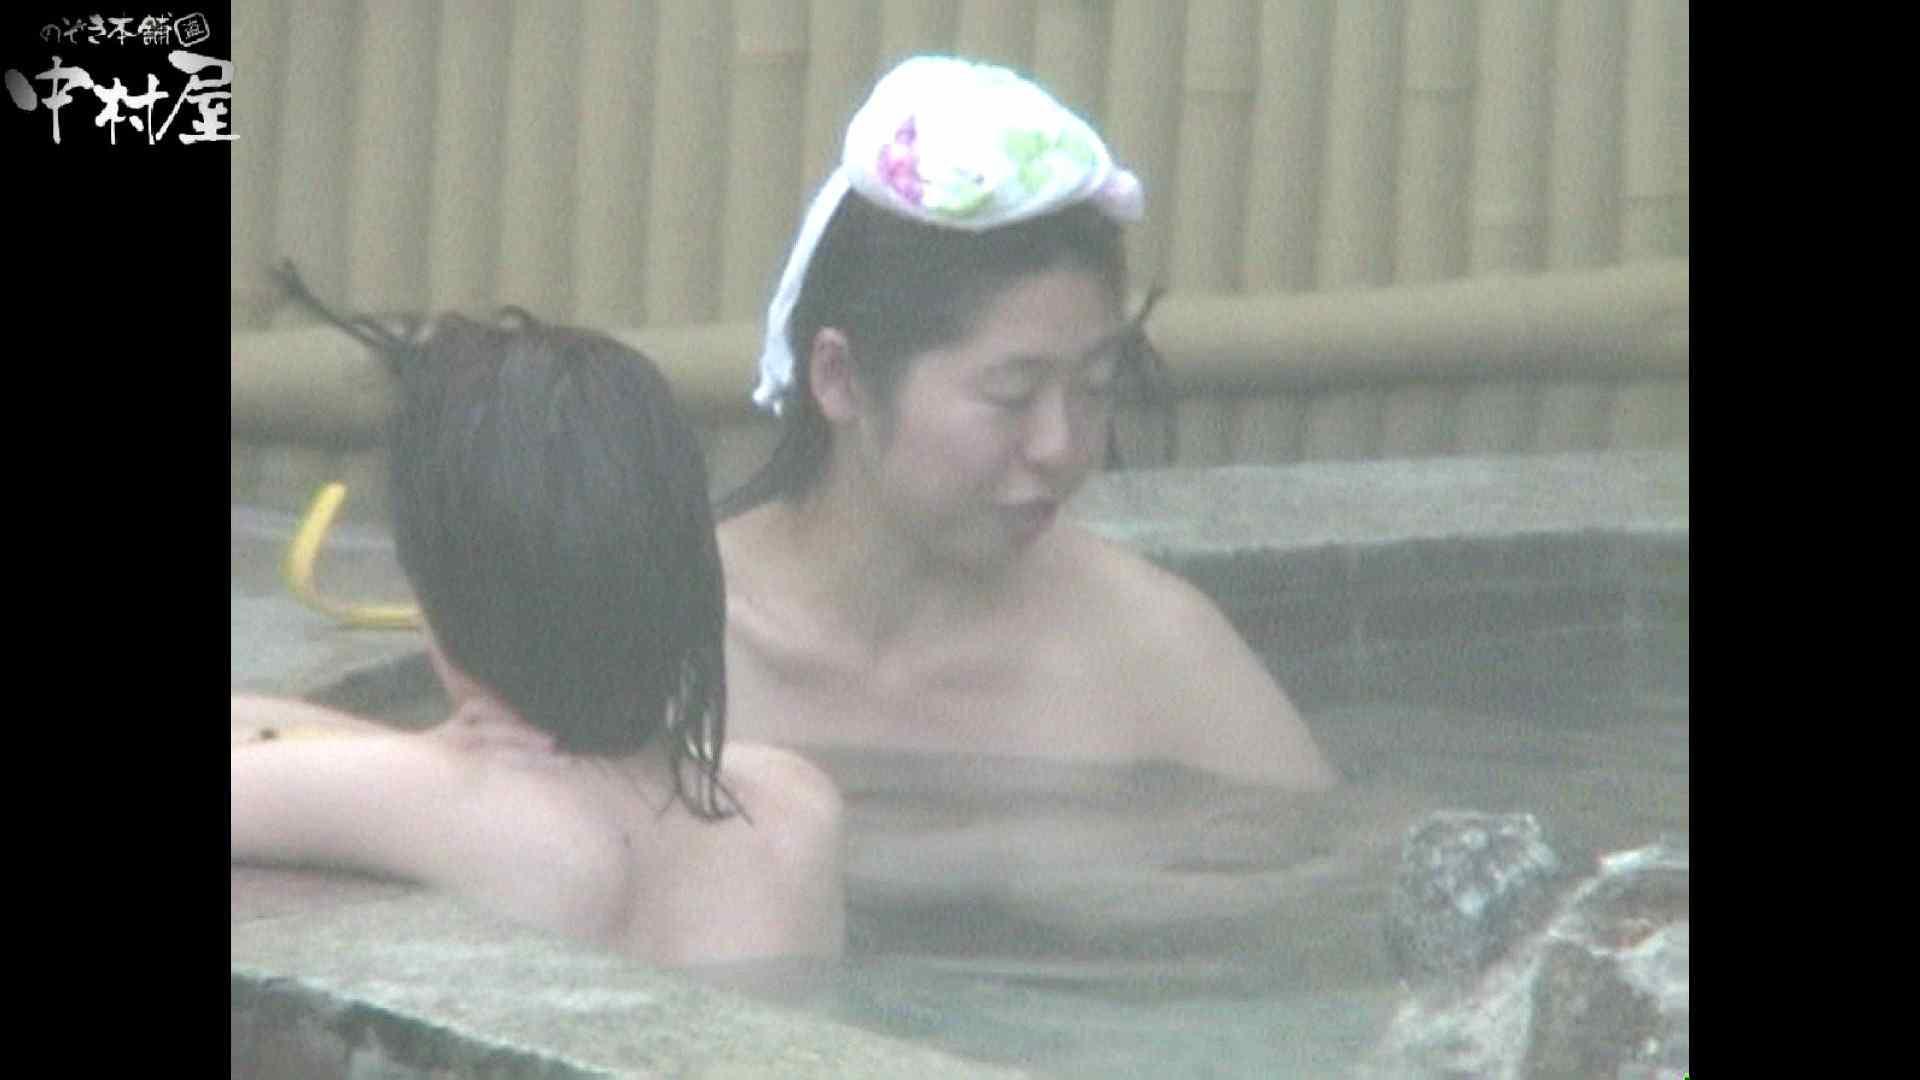 Aquaな露天風呂Vol.932 盗撮師作品   露天風呂突入  106pic 58